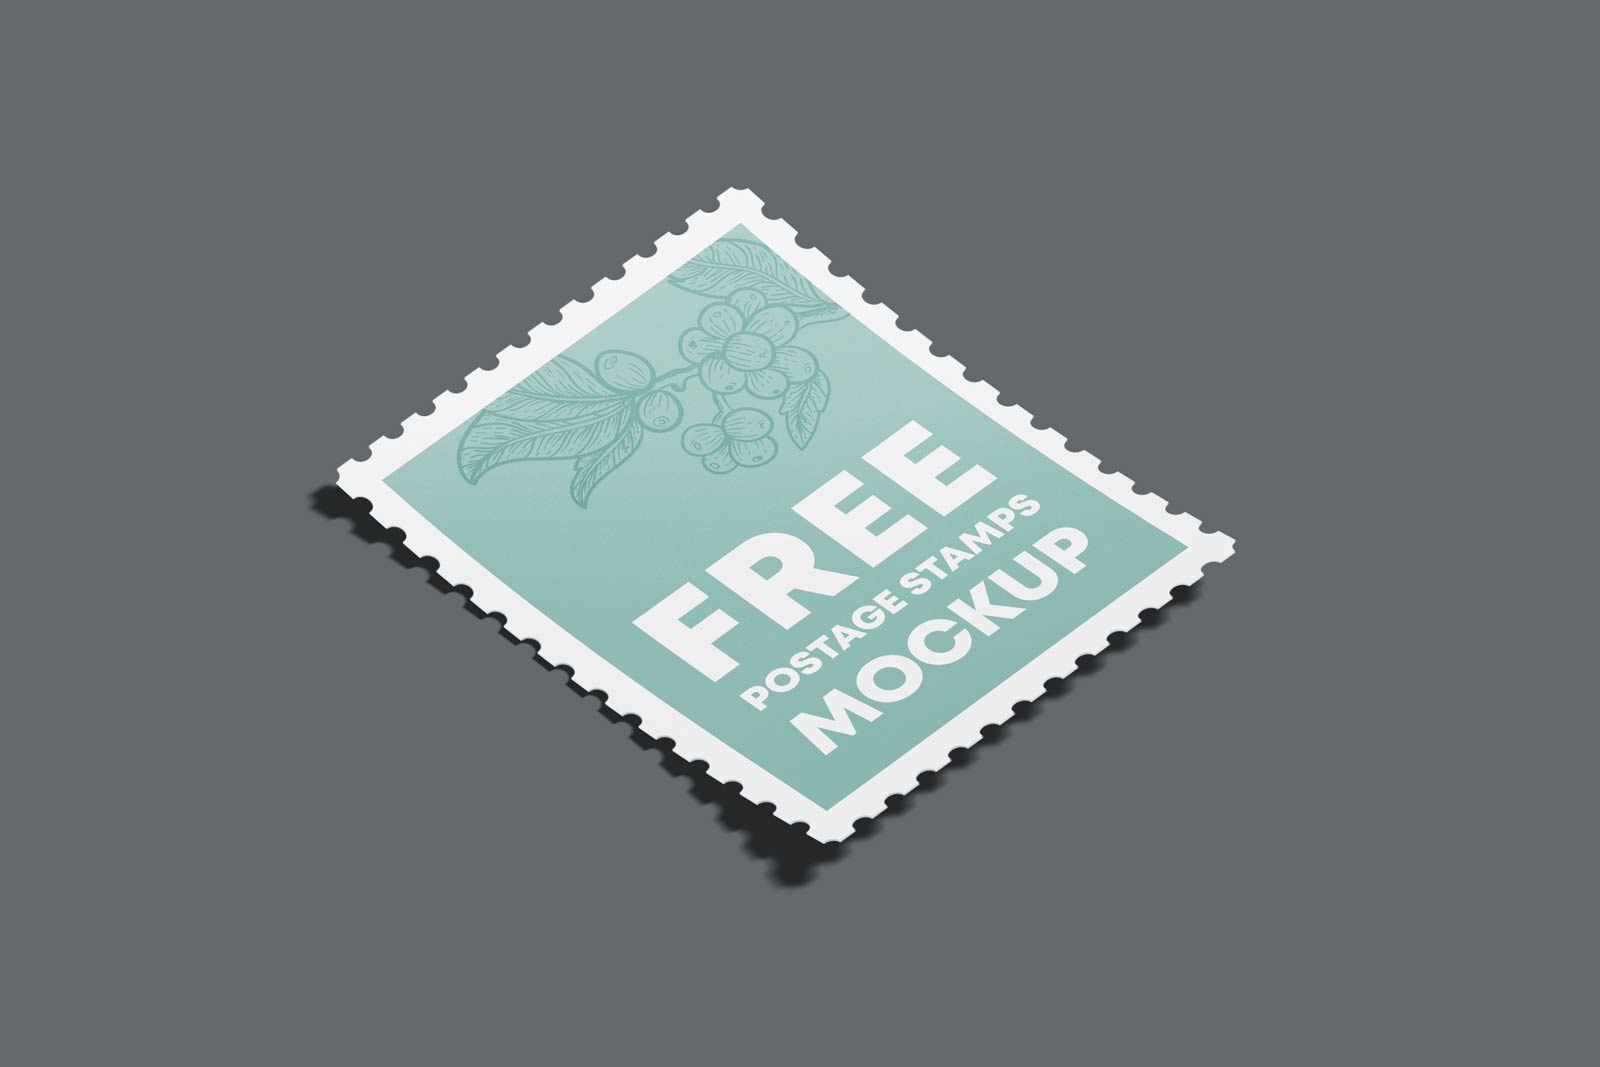 Free Postage Stamp Mockup PSD